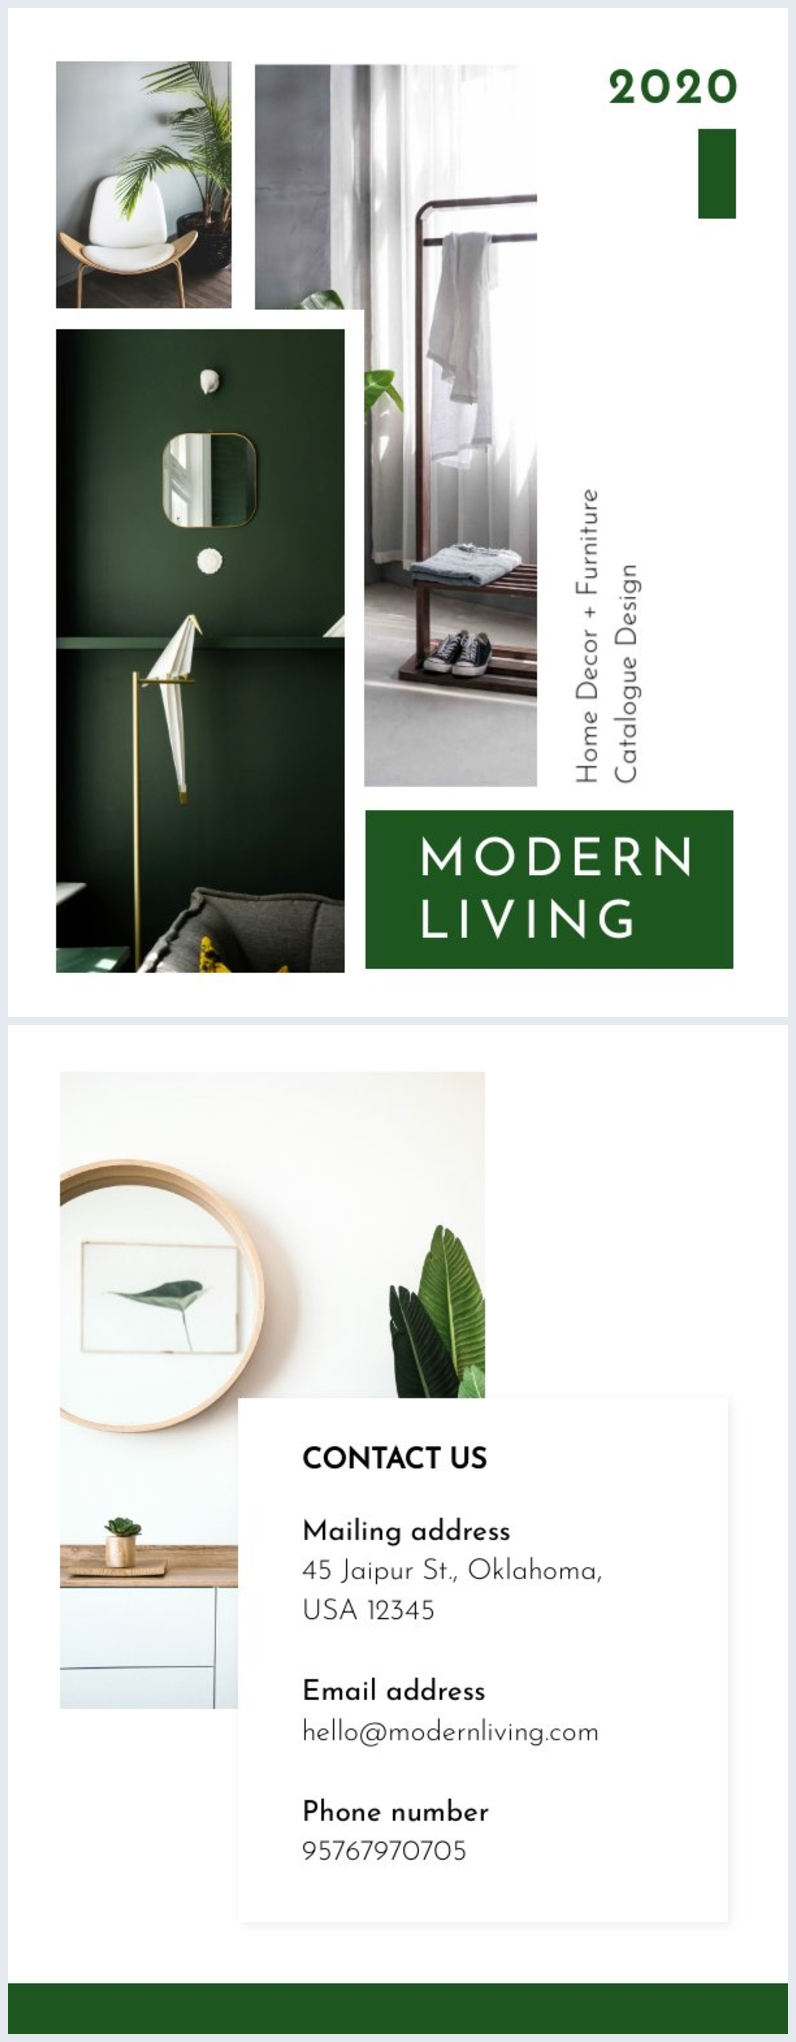 Diseño moderno para portada de catálogo